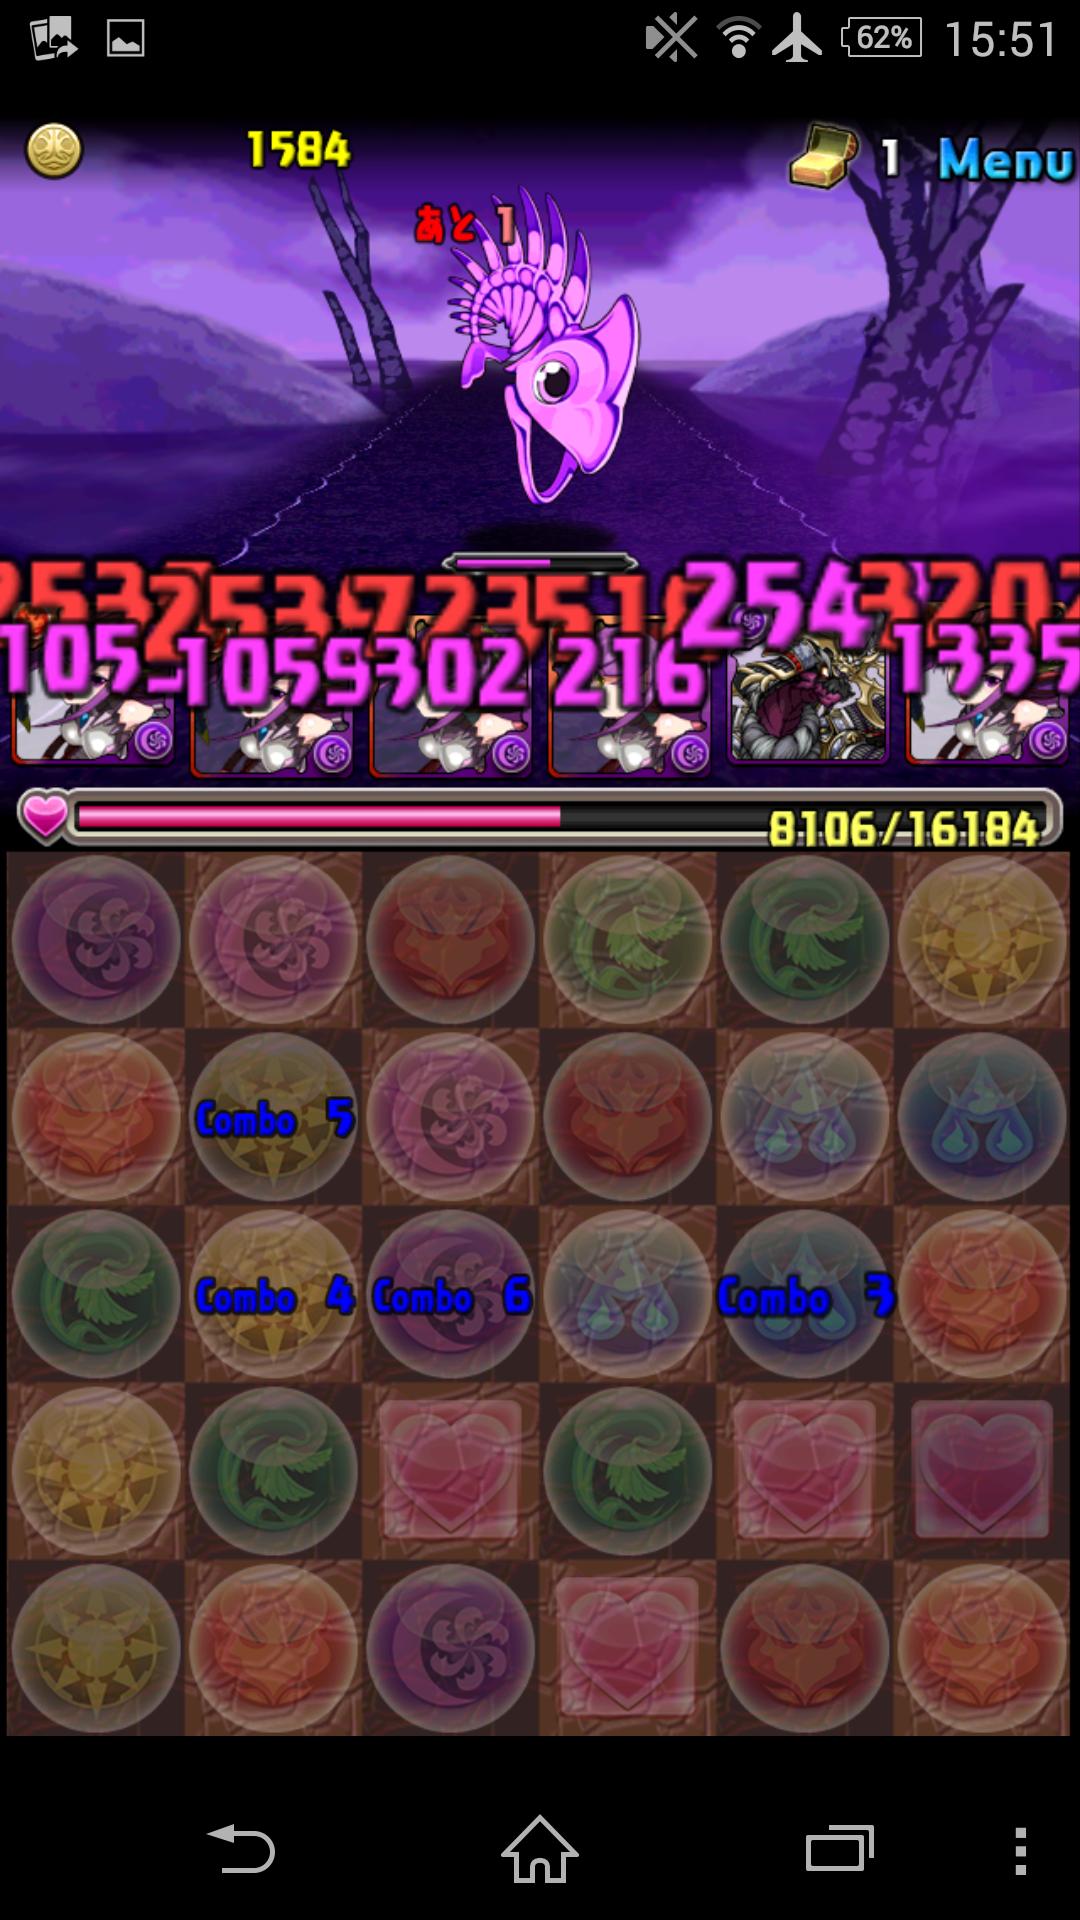 Screenshot_2014-08-20-15-51-53.png